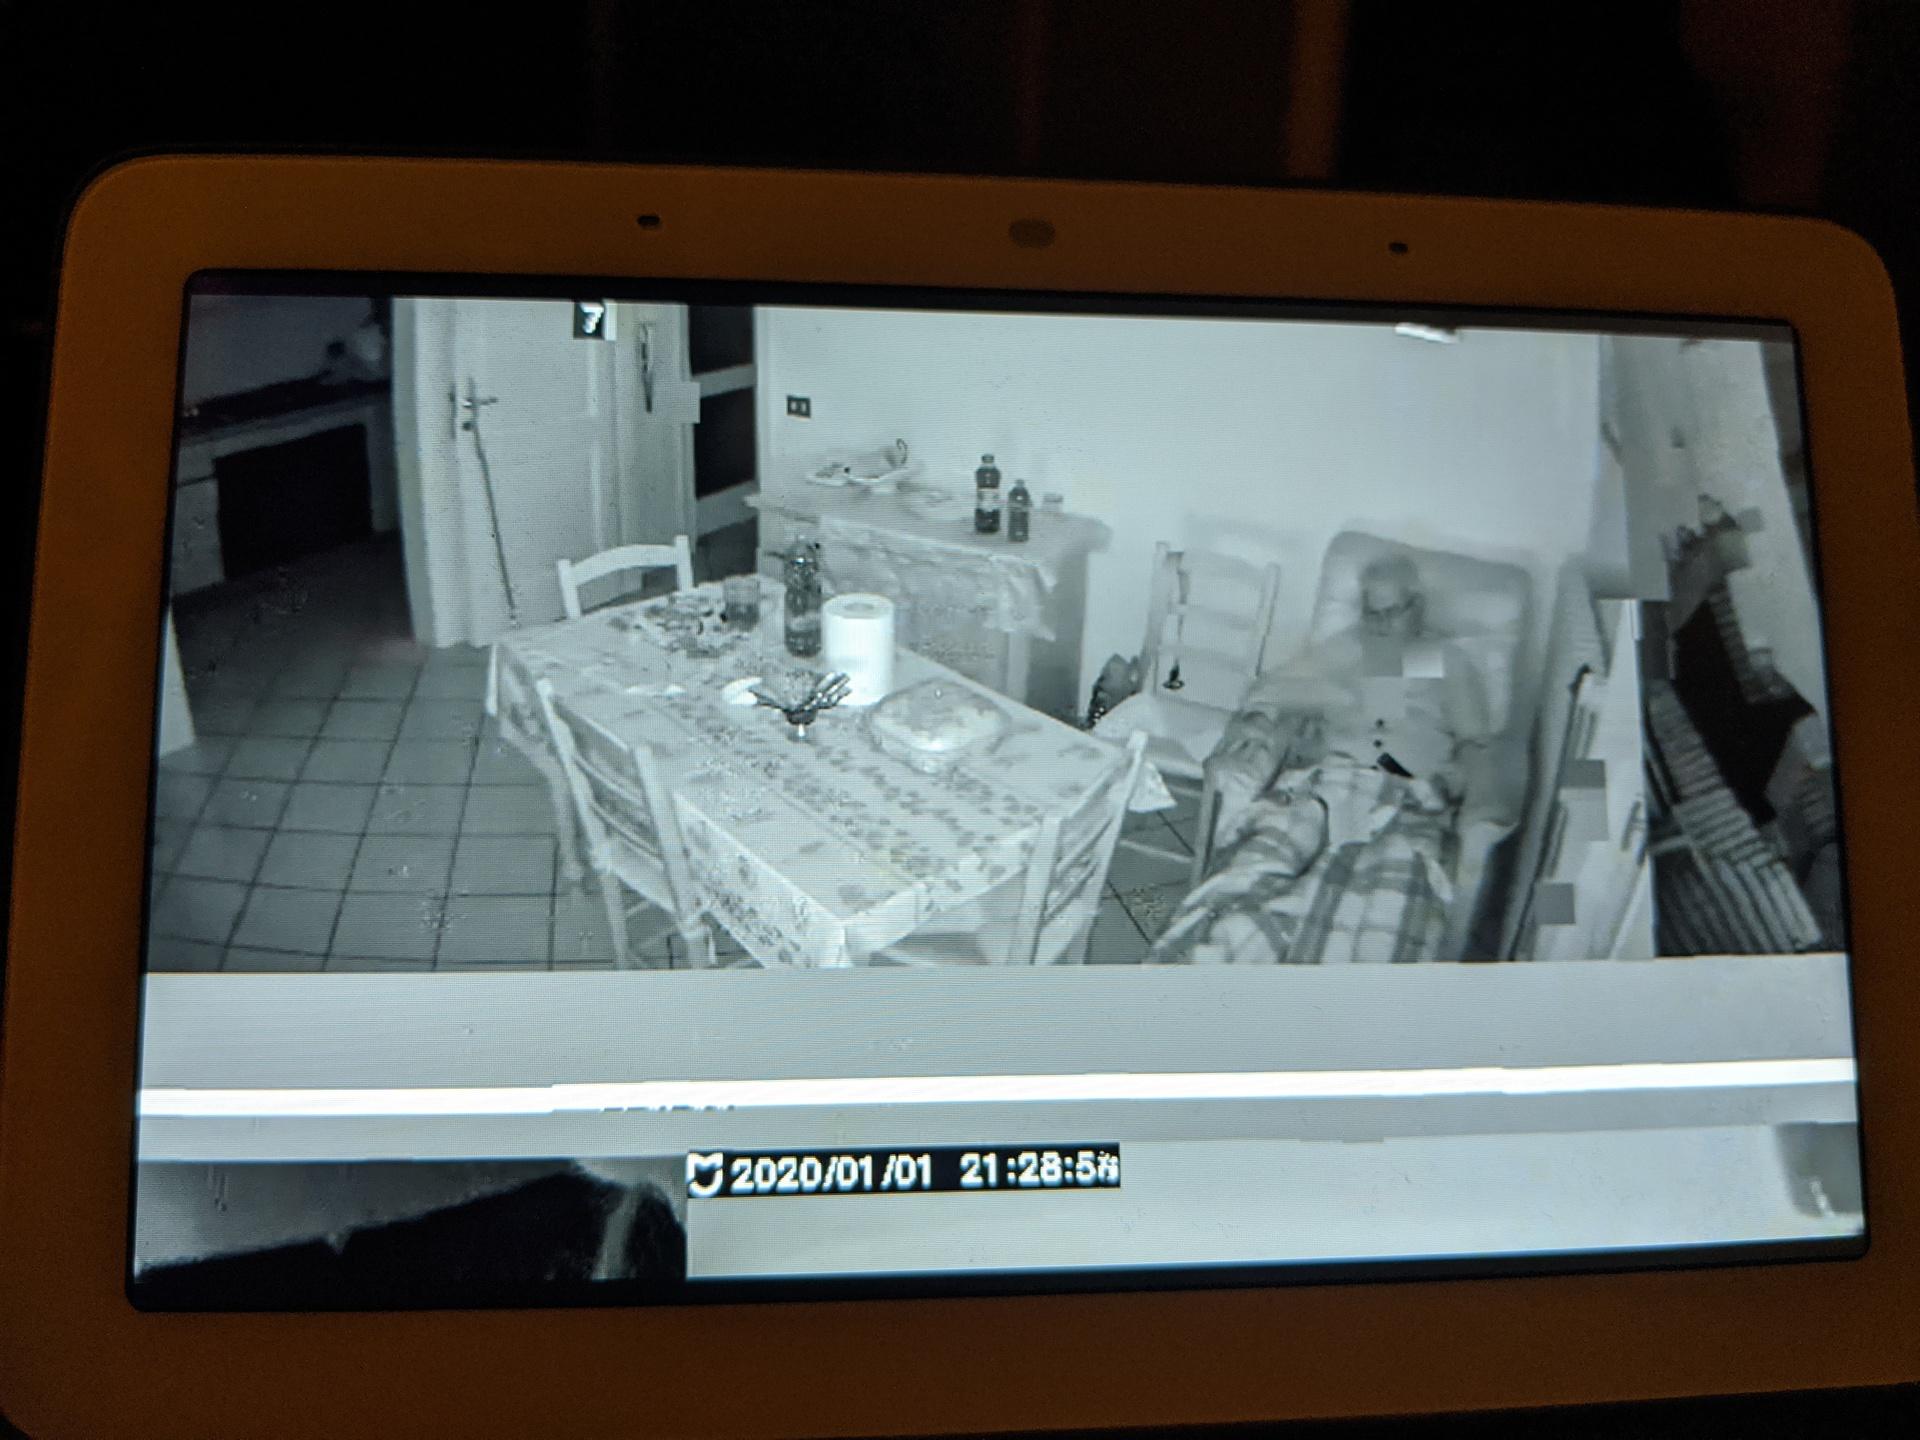 Google Nest Hub Xiaomi Security Camera Bug 6